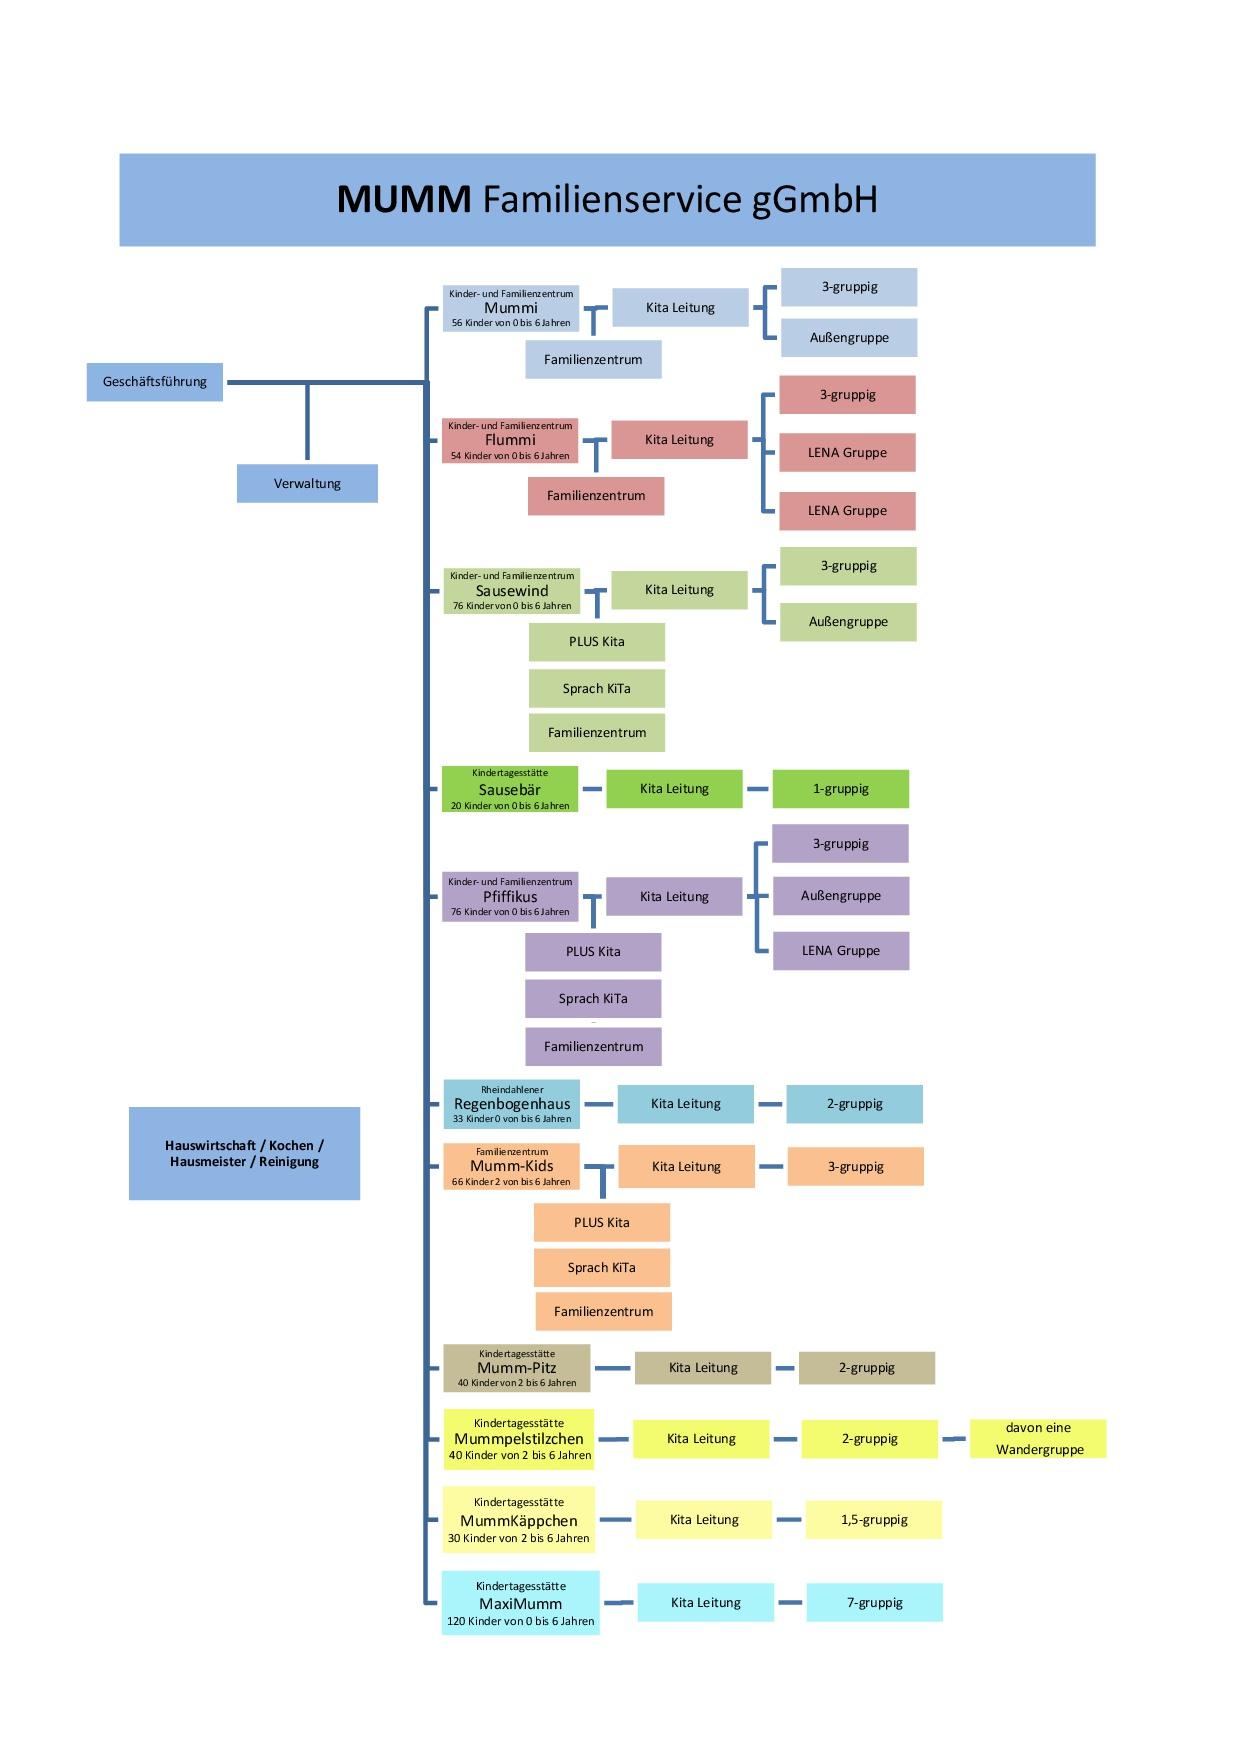 Organigramm MUMM Familienservice gGmbH